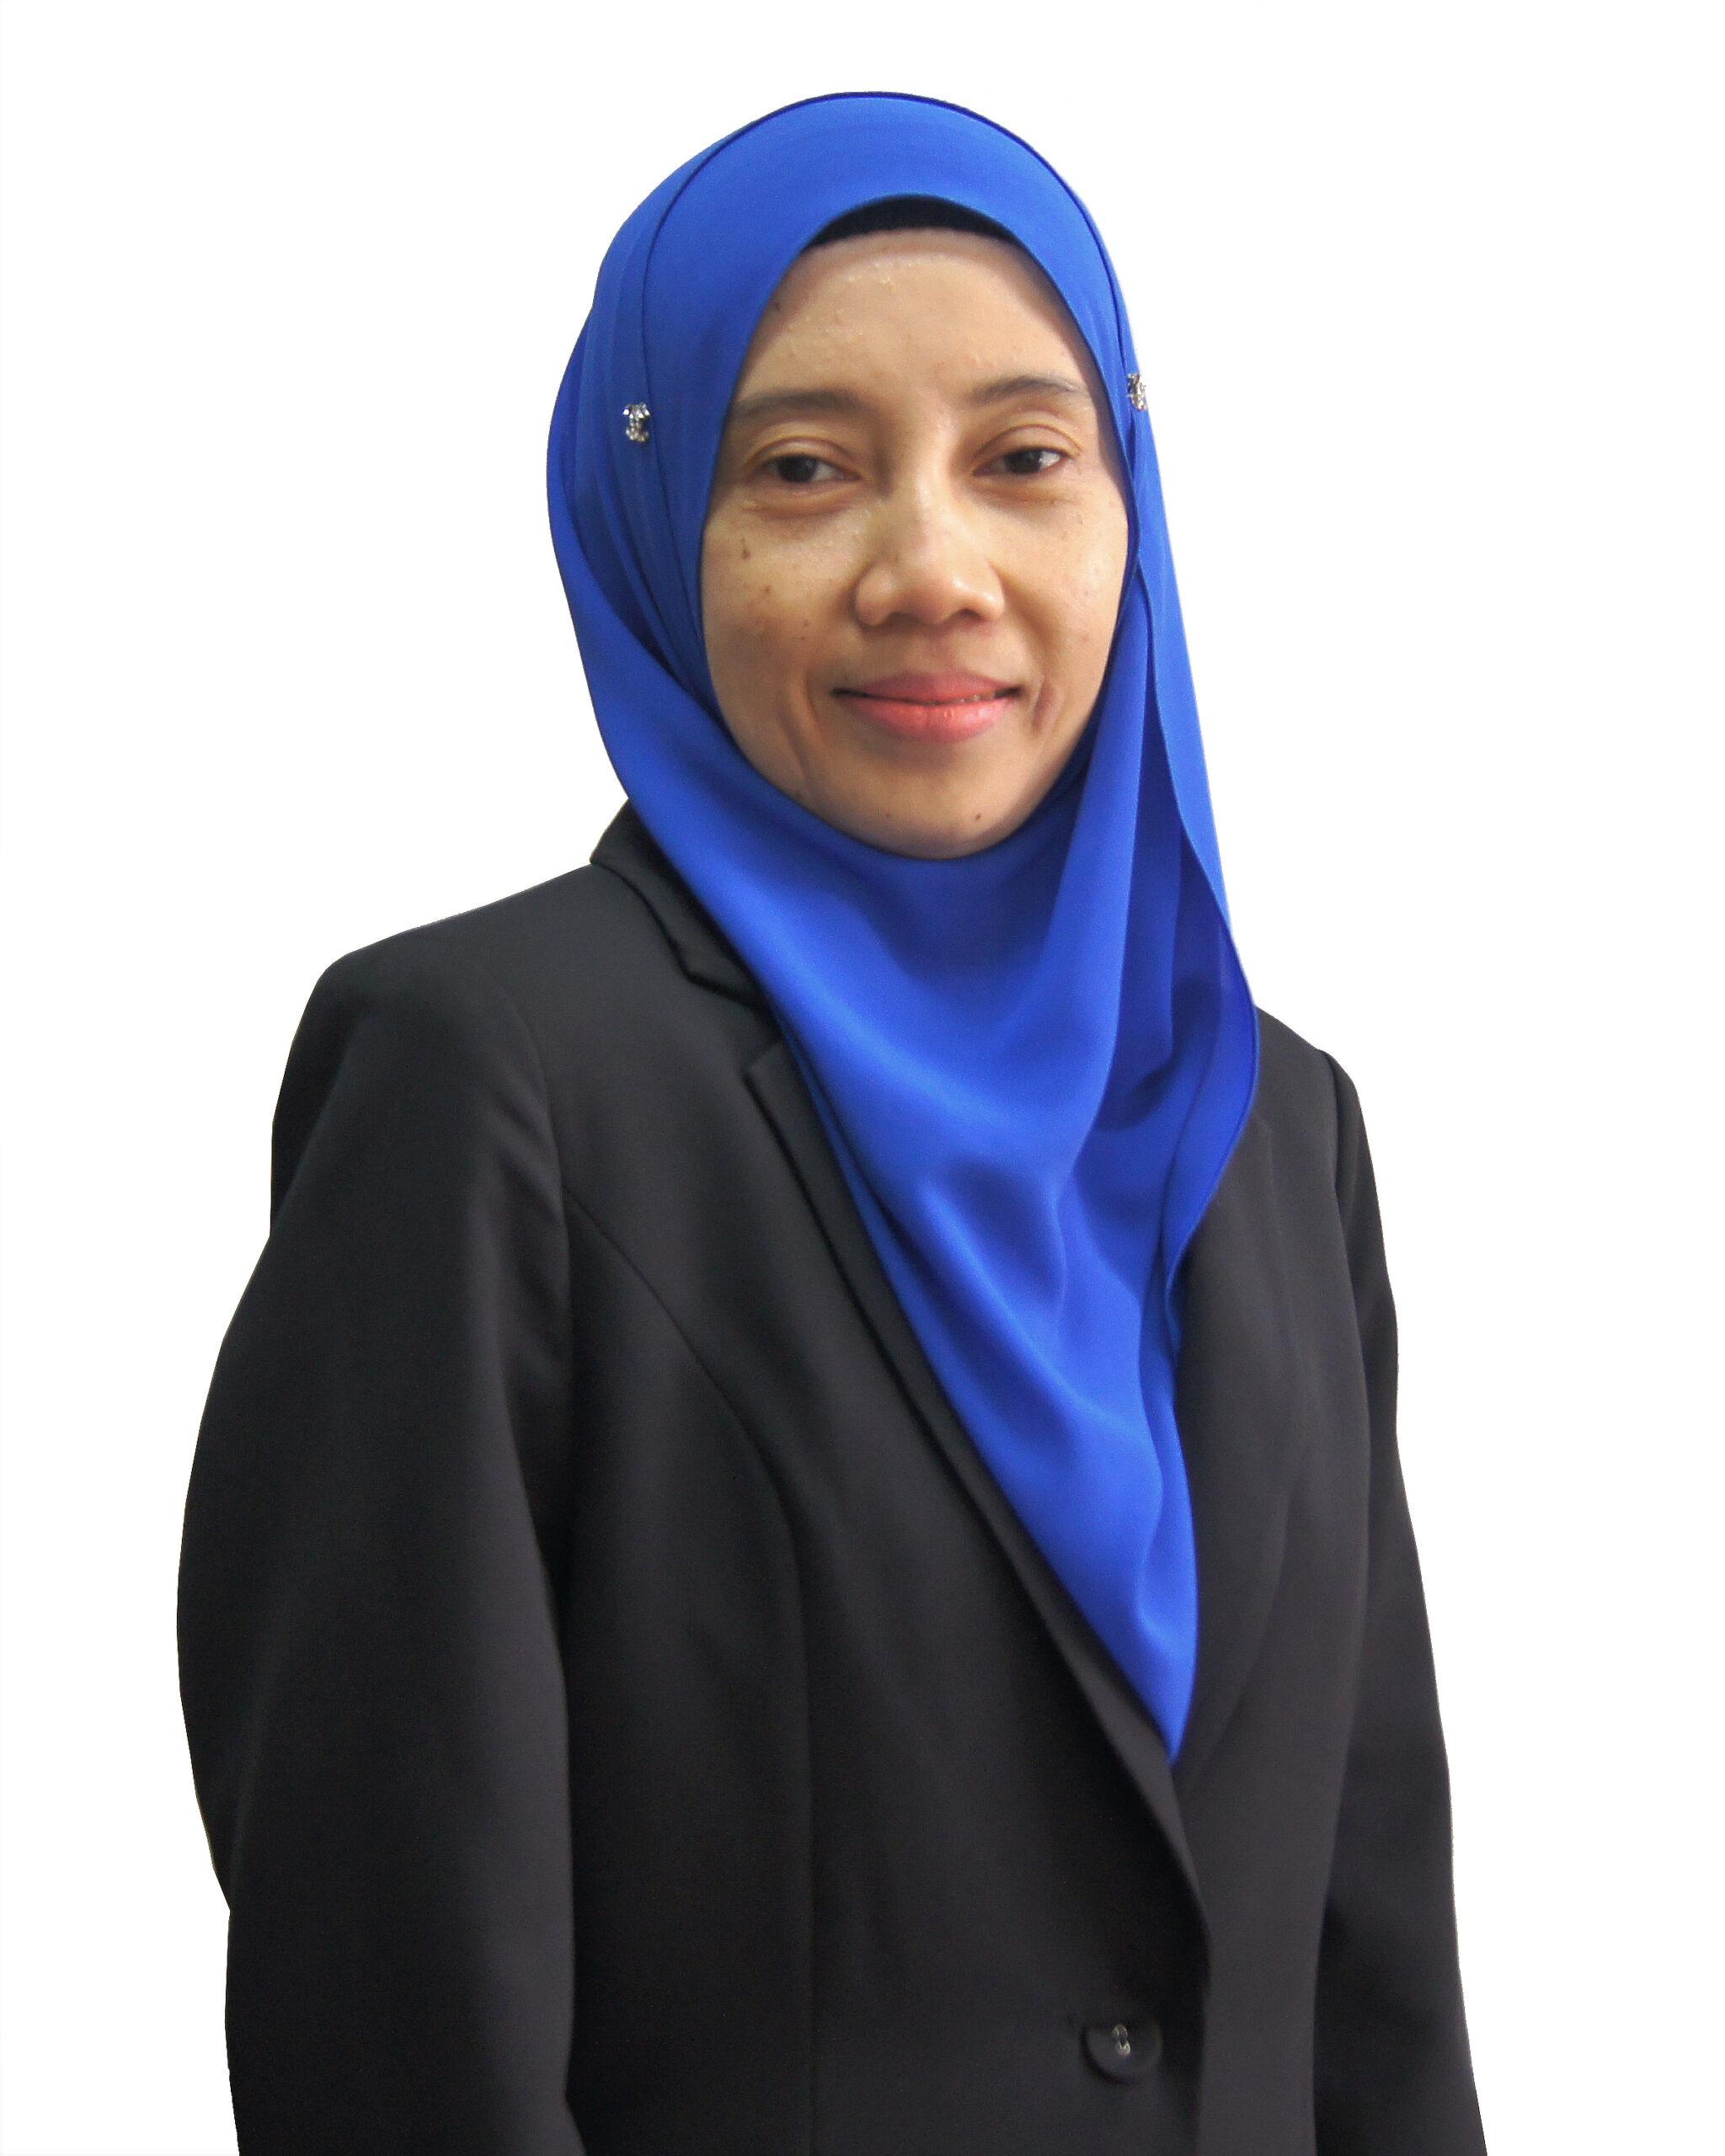 Noor Hayati Bin Mohamad Yusak